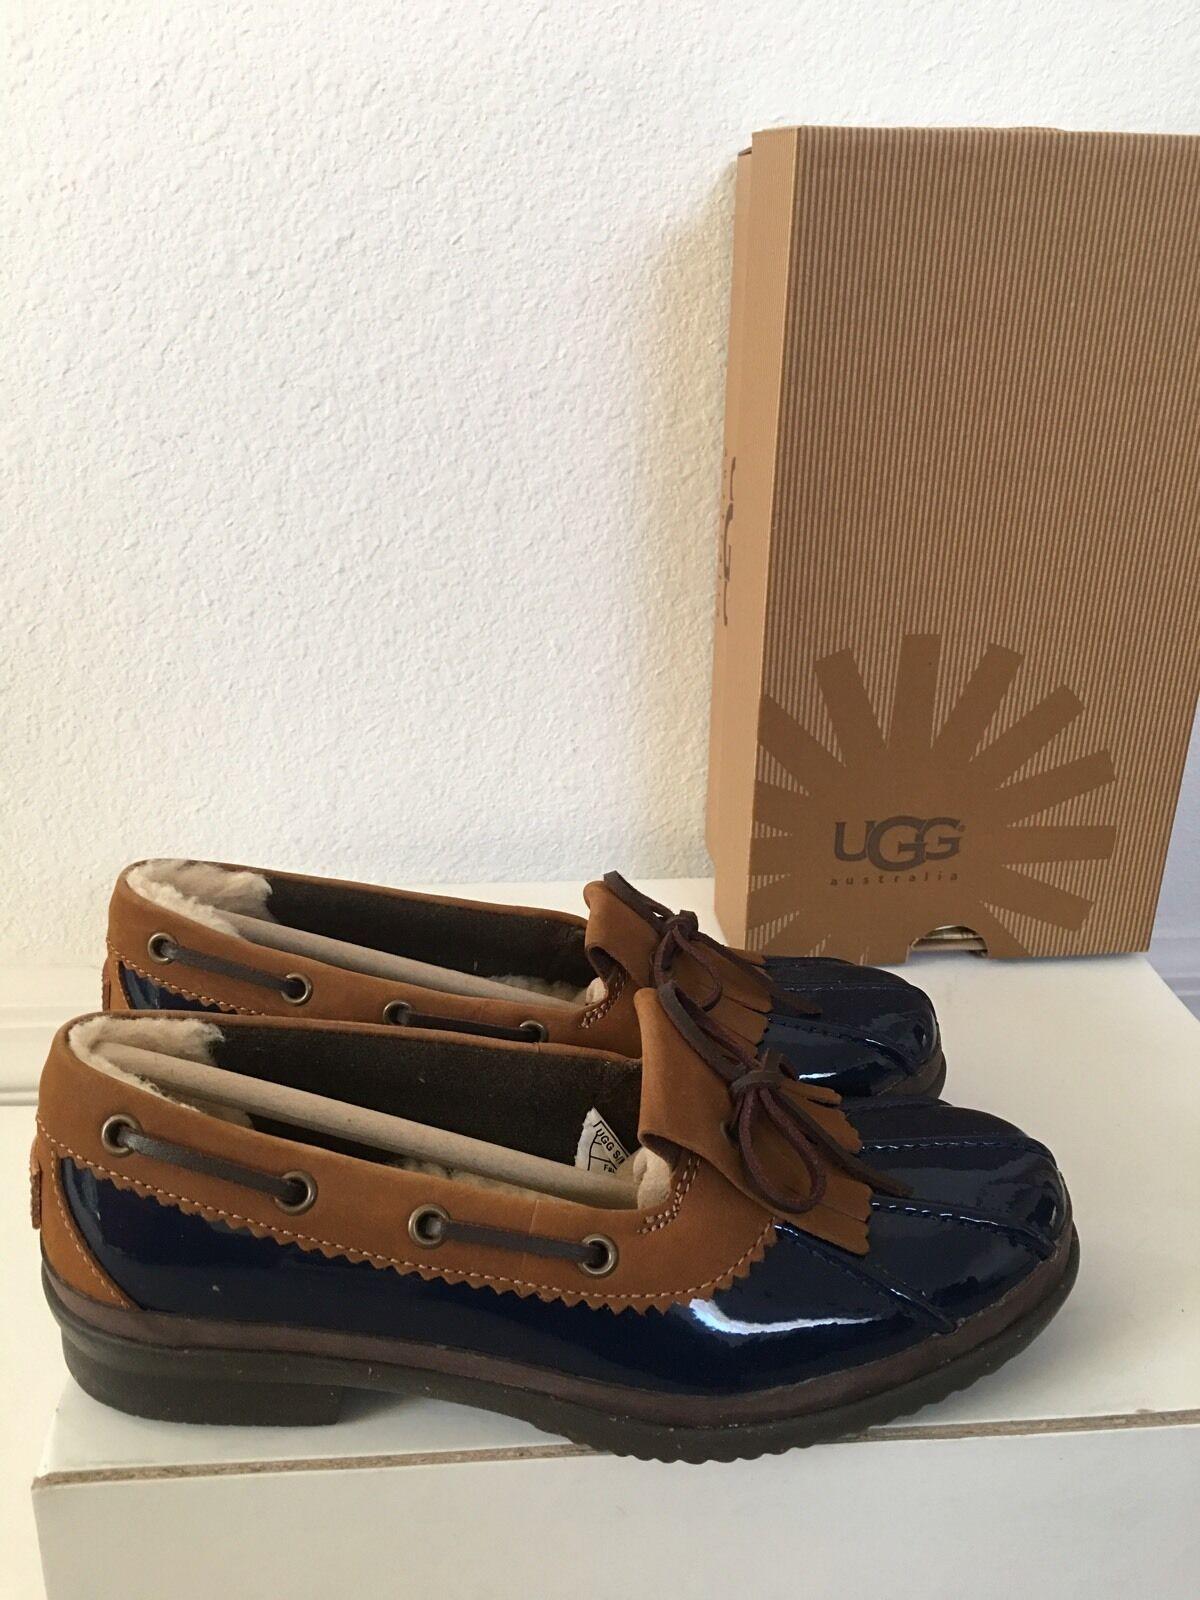 Ugg Haylie Navy Schuhes, Duck Schuhes, Navy 5.5, NIB. 4e498b